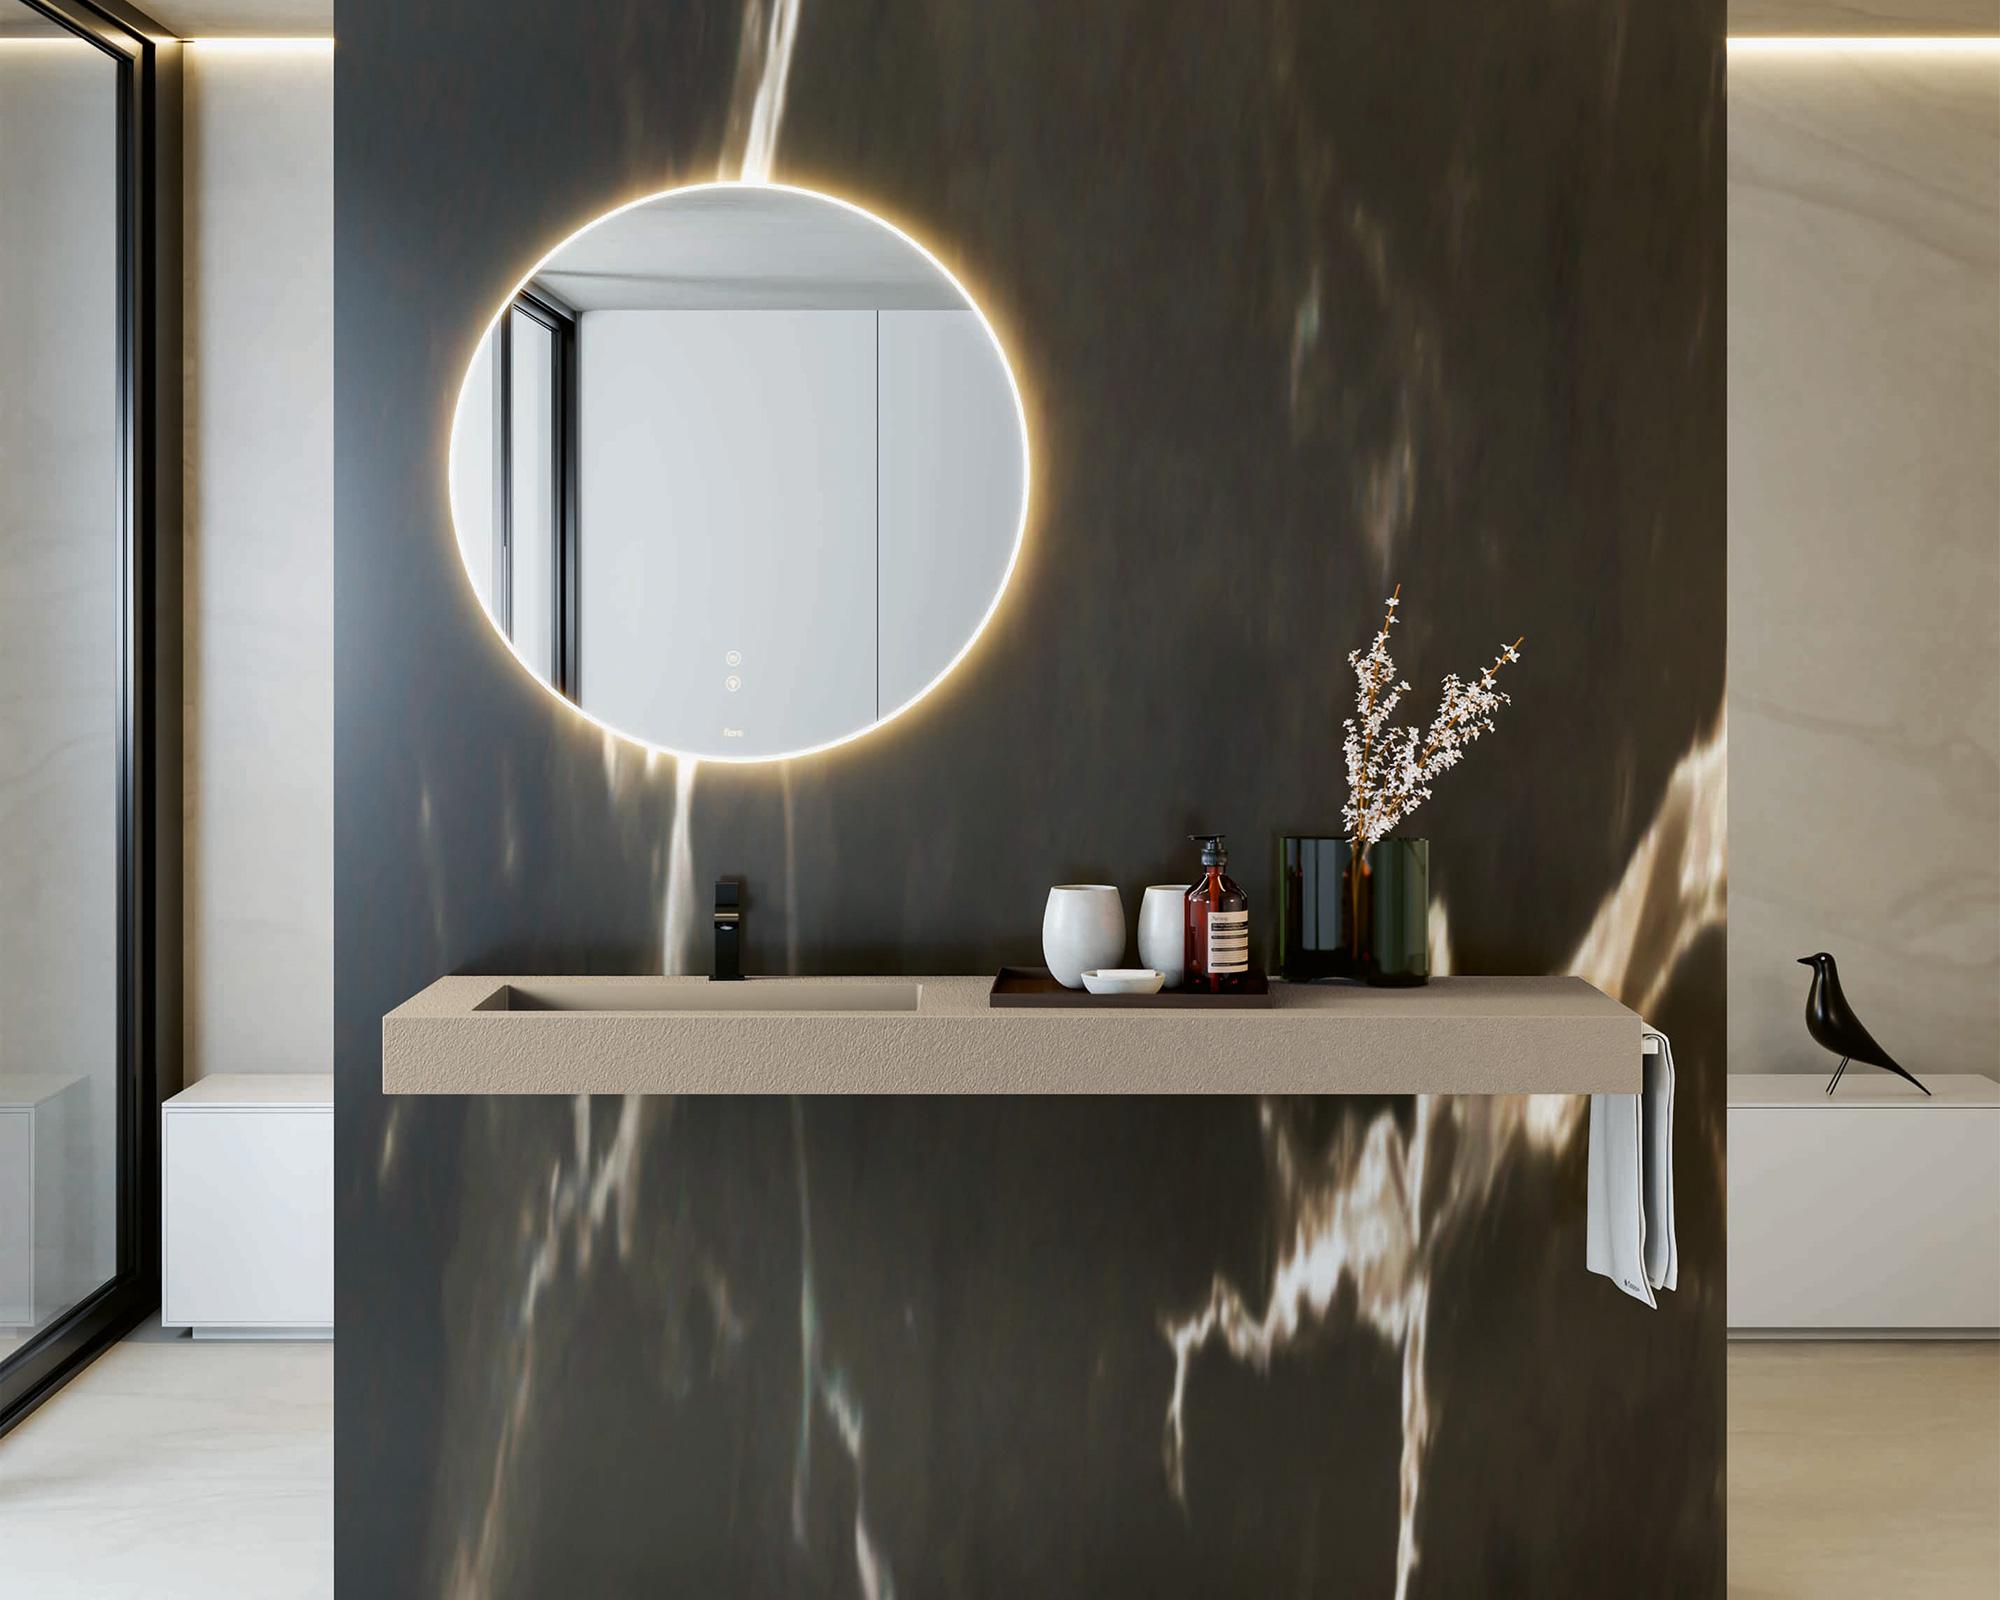 Bathroom Trends 2021 Inspiring New Looks For Your Bathroom Homes Gardens